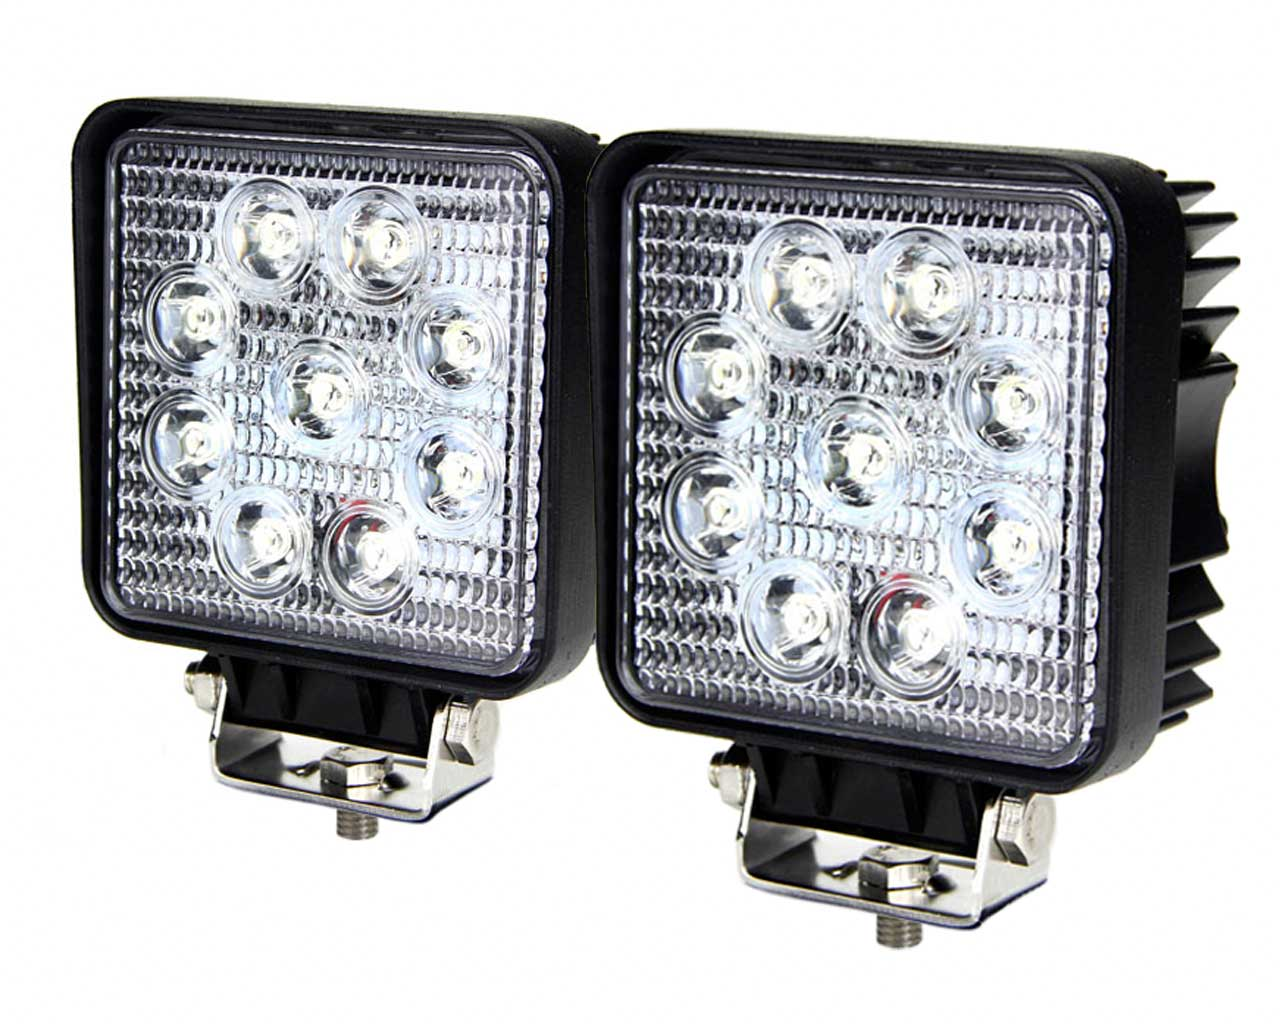 lighting light bulbs super hk p drl lights car strip for bright lamp cars led automotive c fog